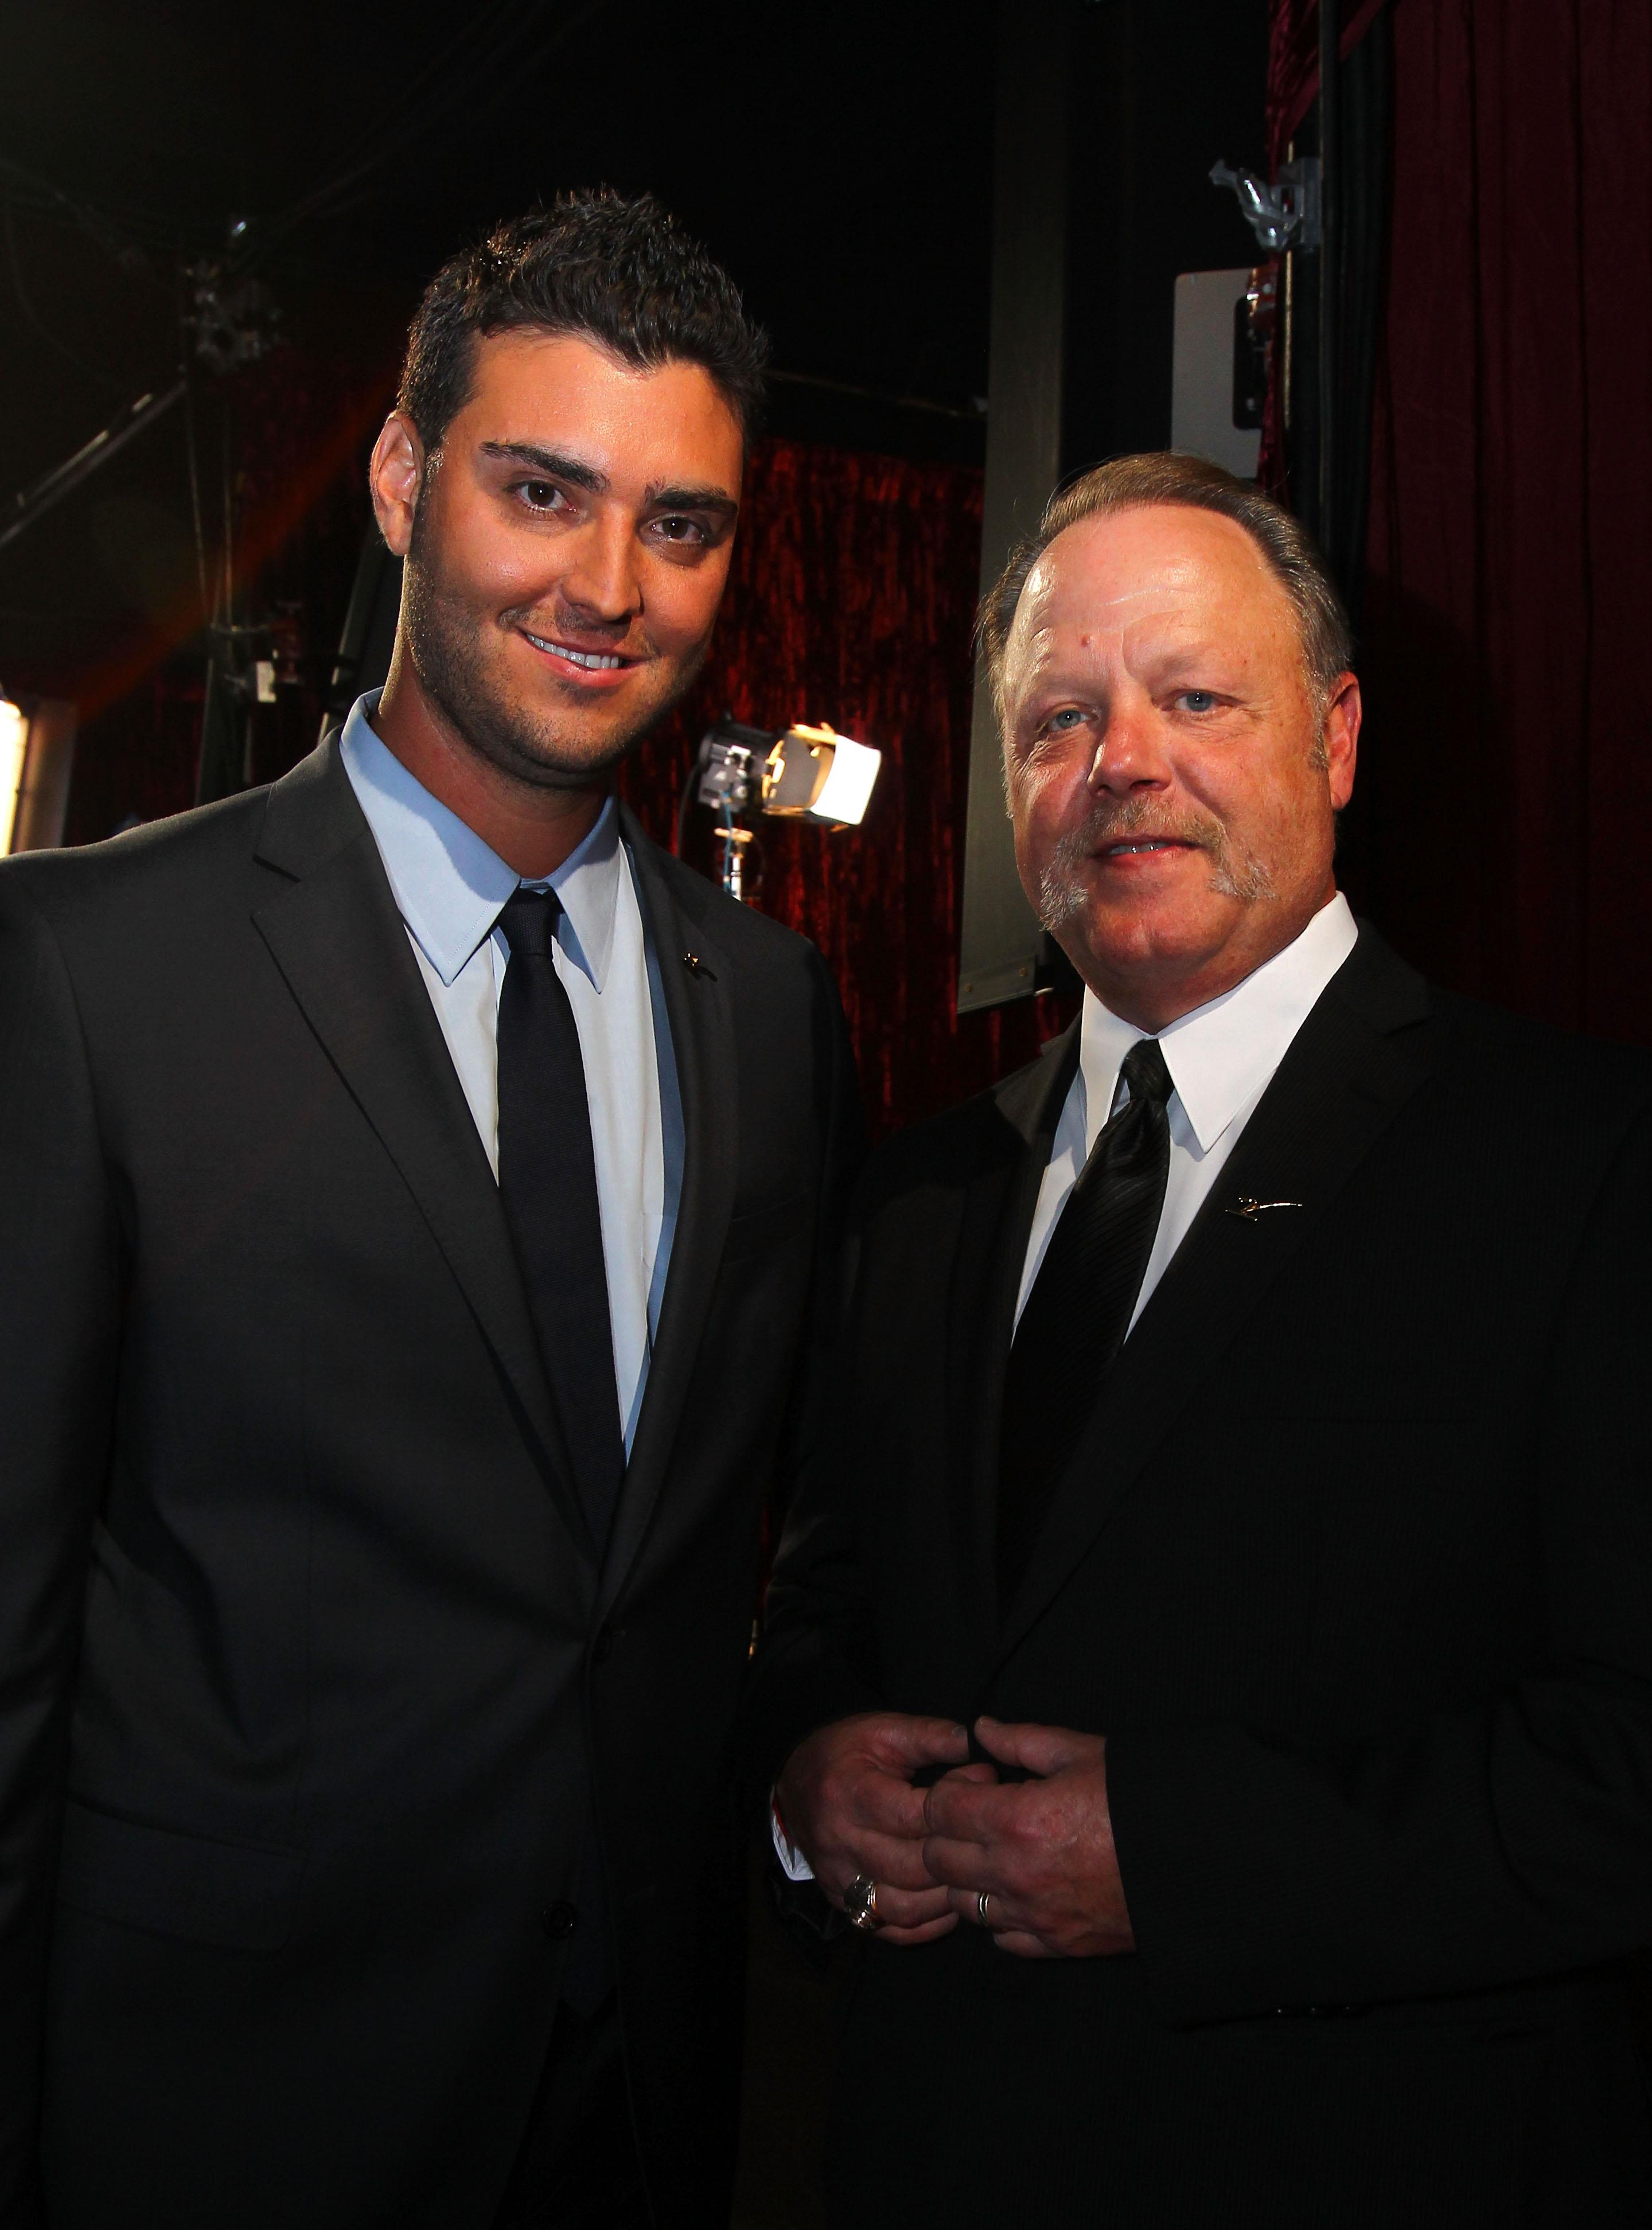 Armando Galarraga and Jim Joyce